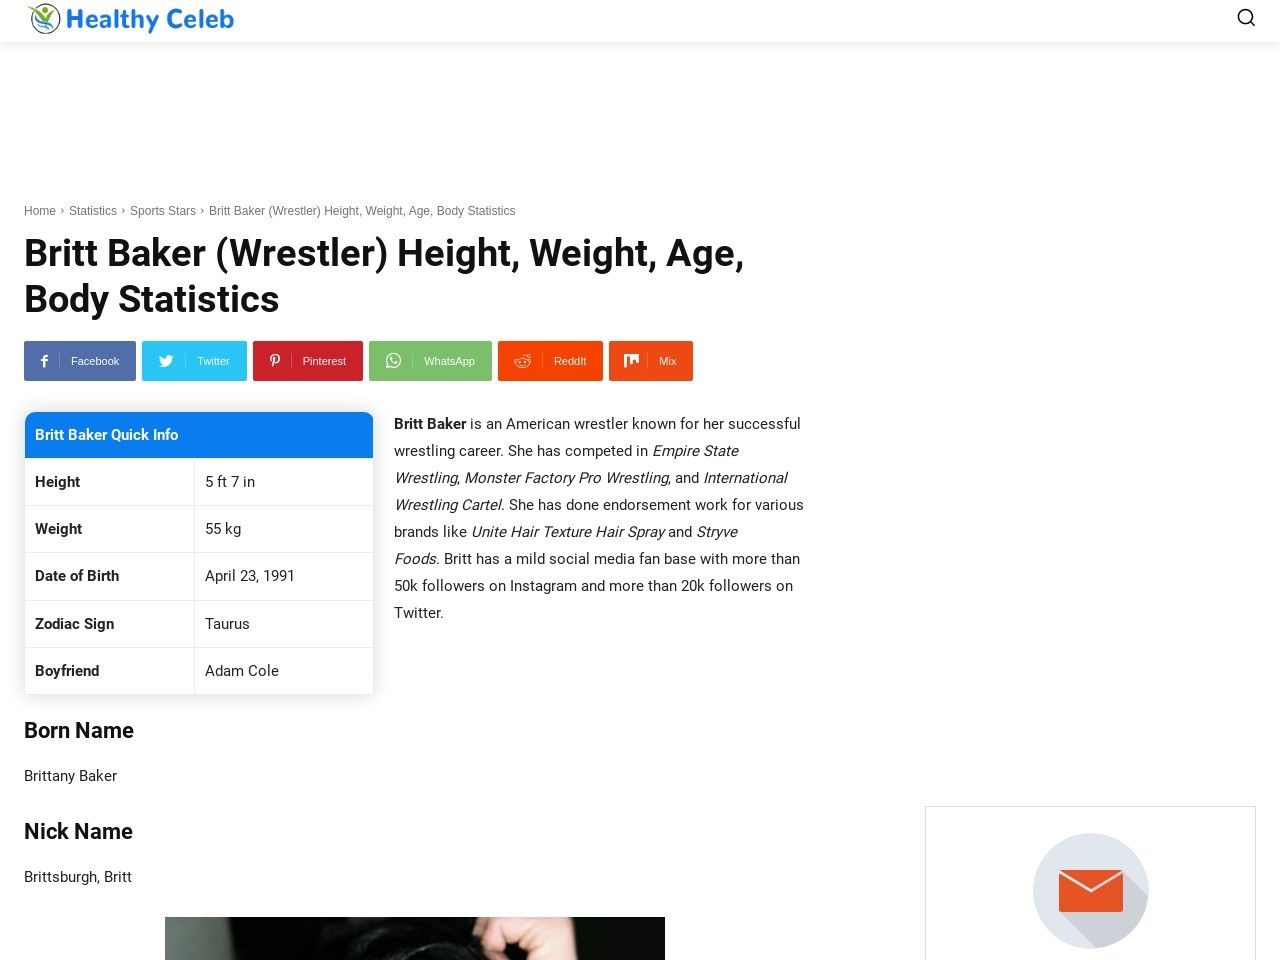 Britt Baker (Wrestler) Peak, Weight, Age, Body Statistics